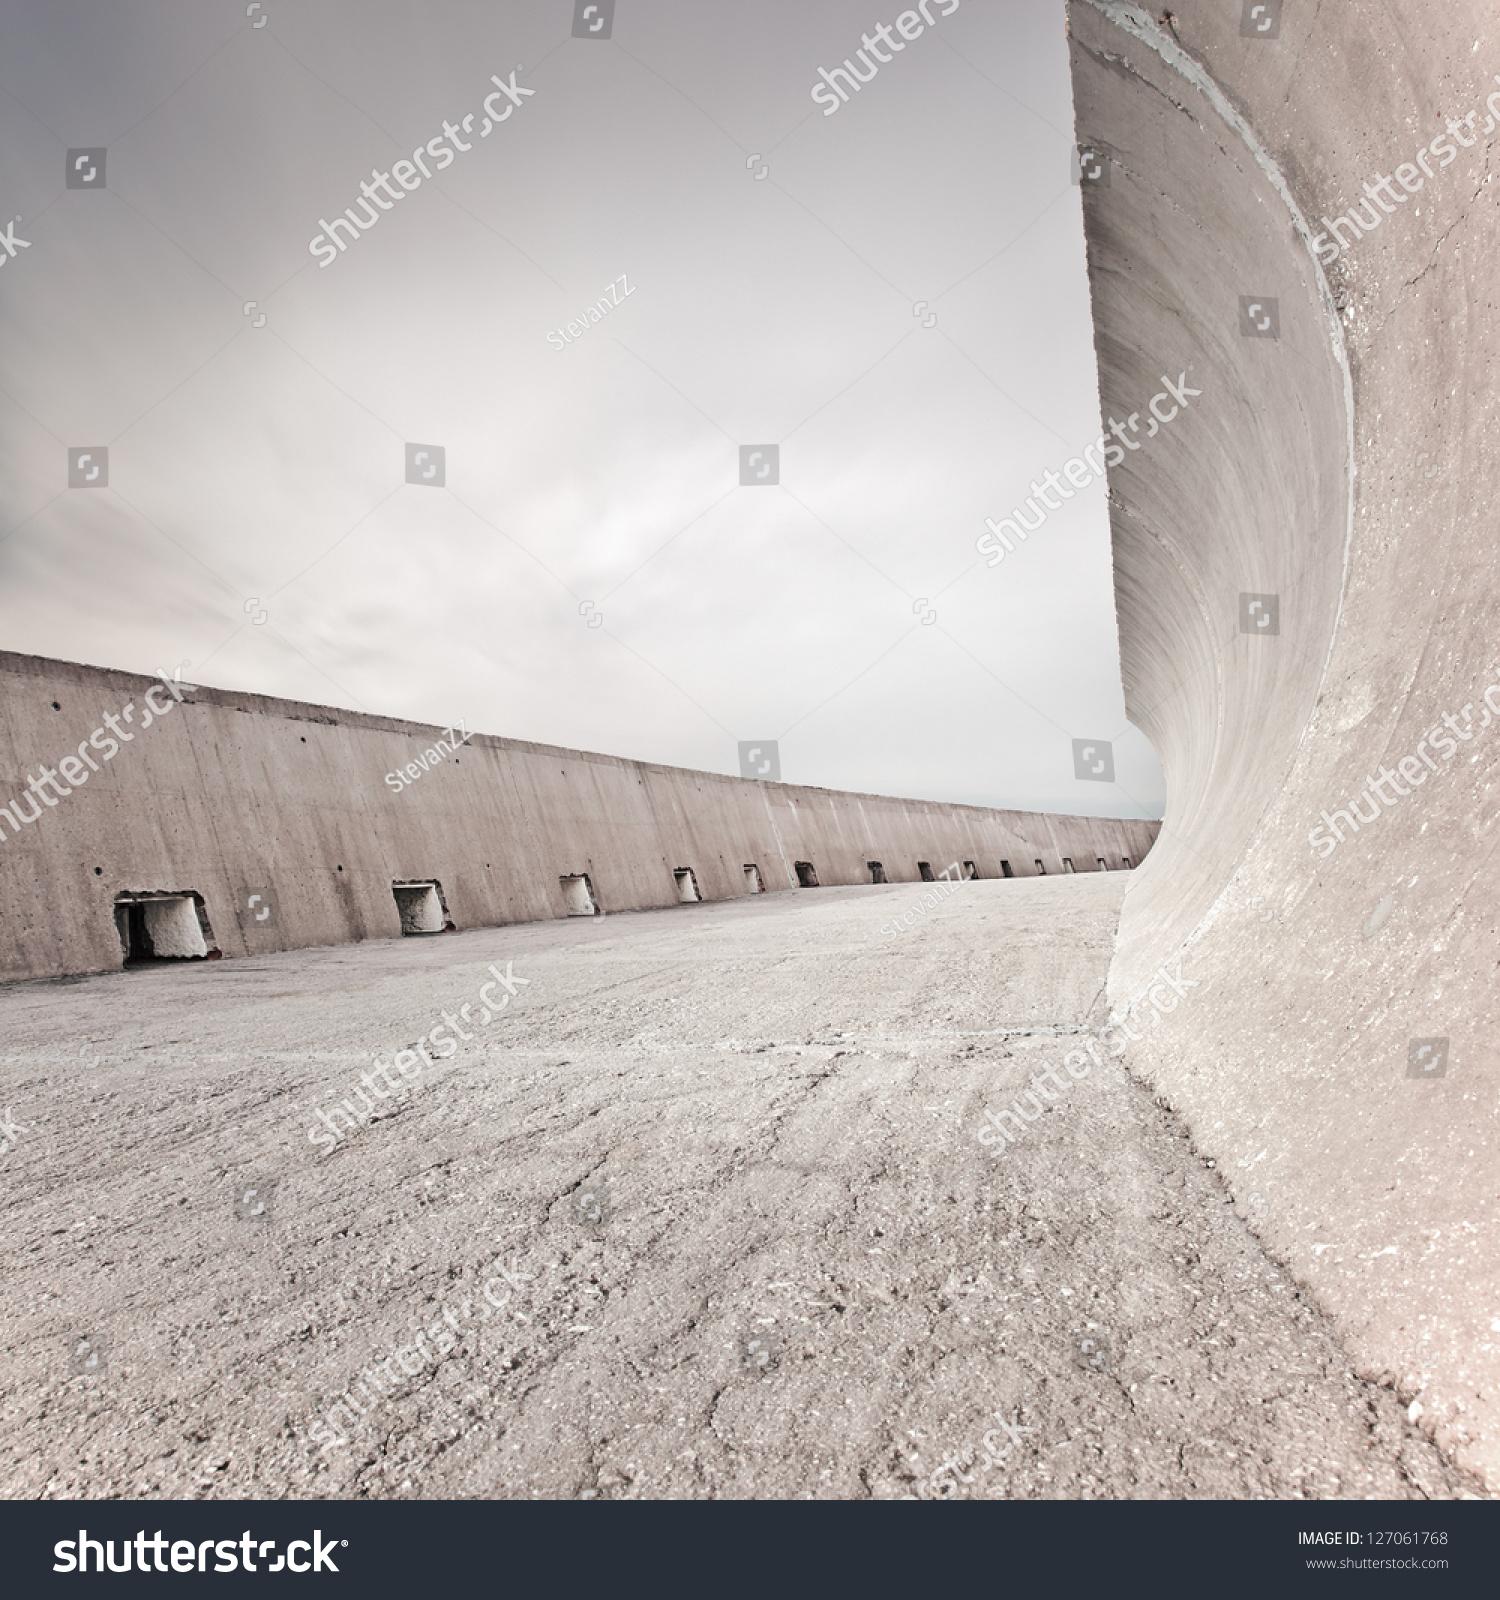 Concrete Dike Wall Design : Concrete dike dam structure wall fence stock photo